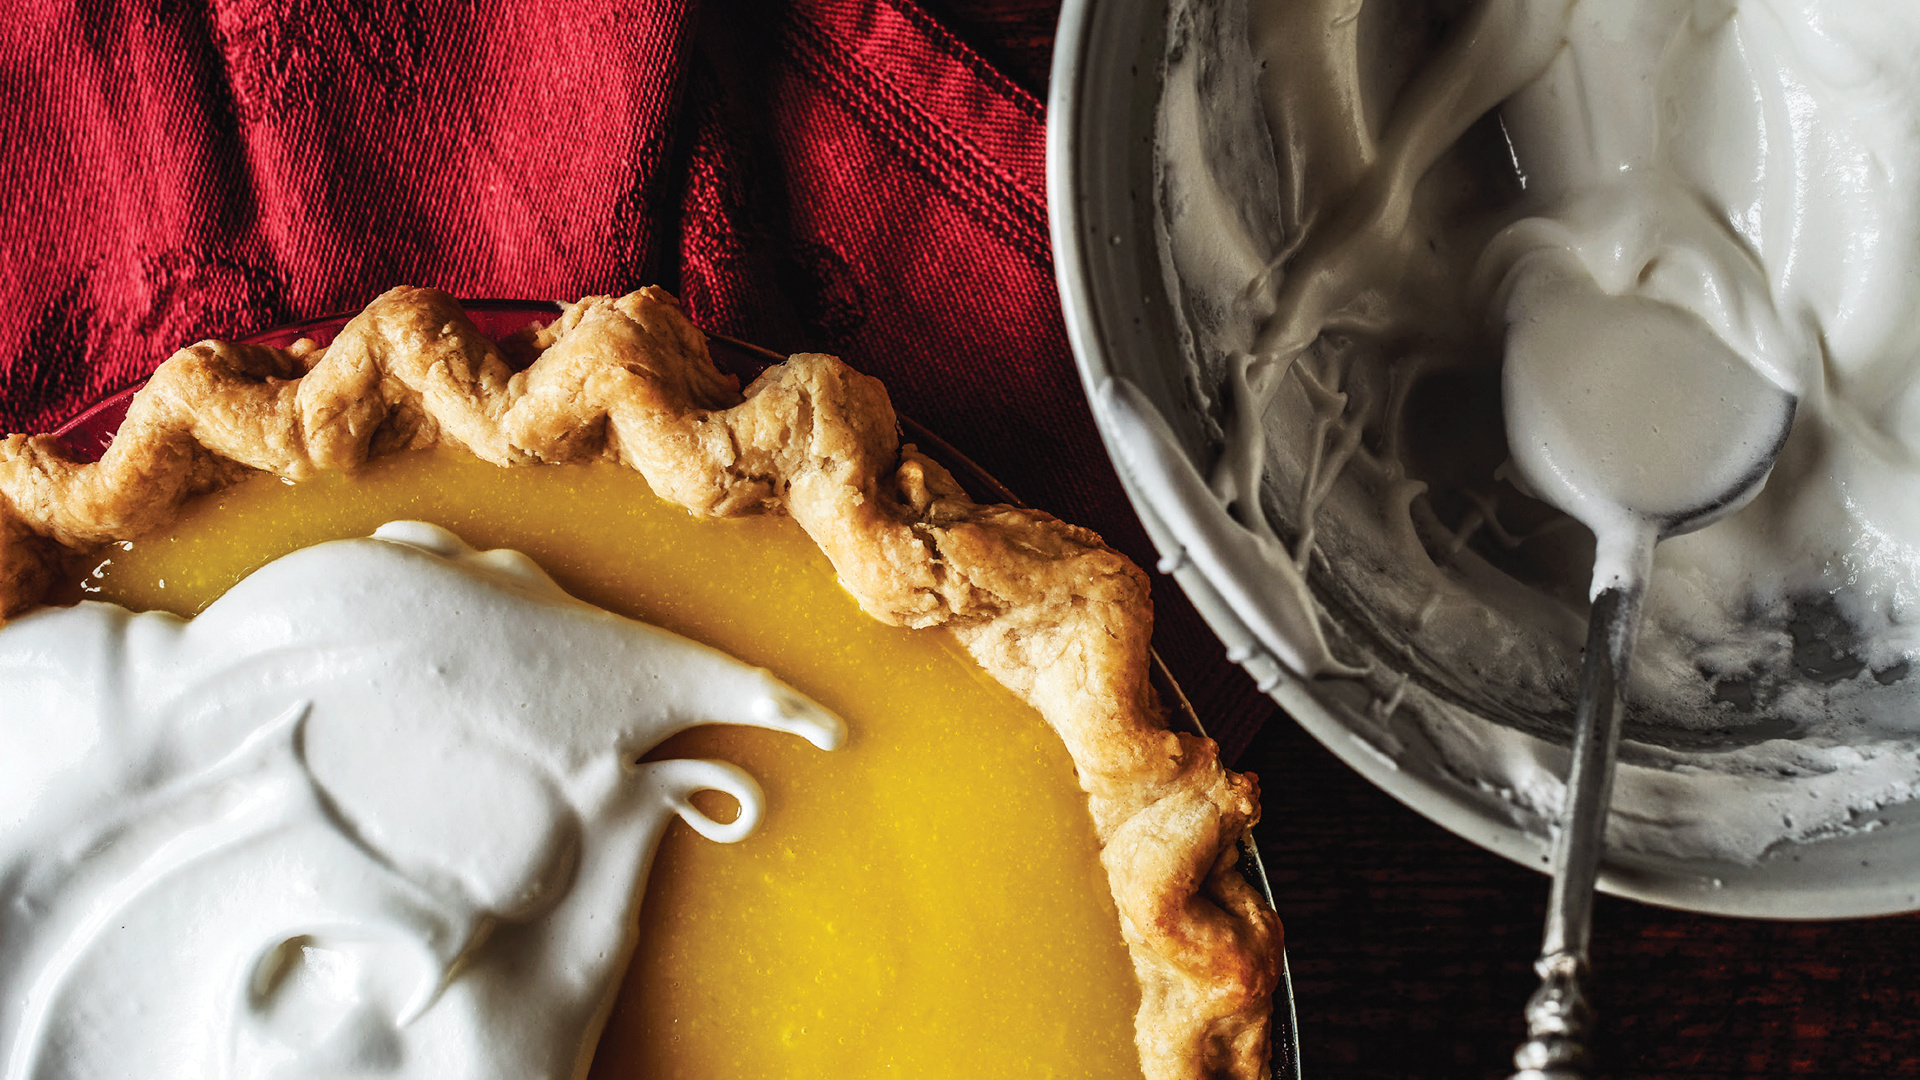 Toni Tipton-Martin's recipe for lemon meringue pie